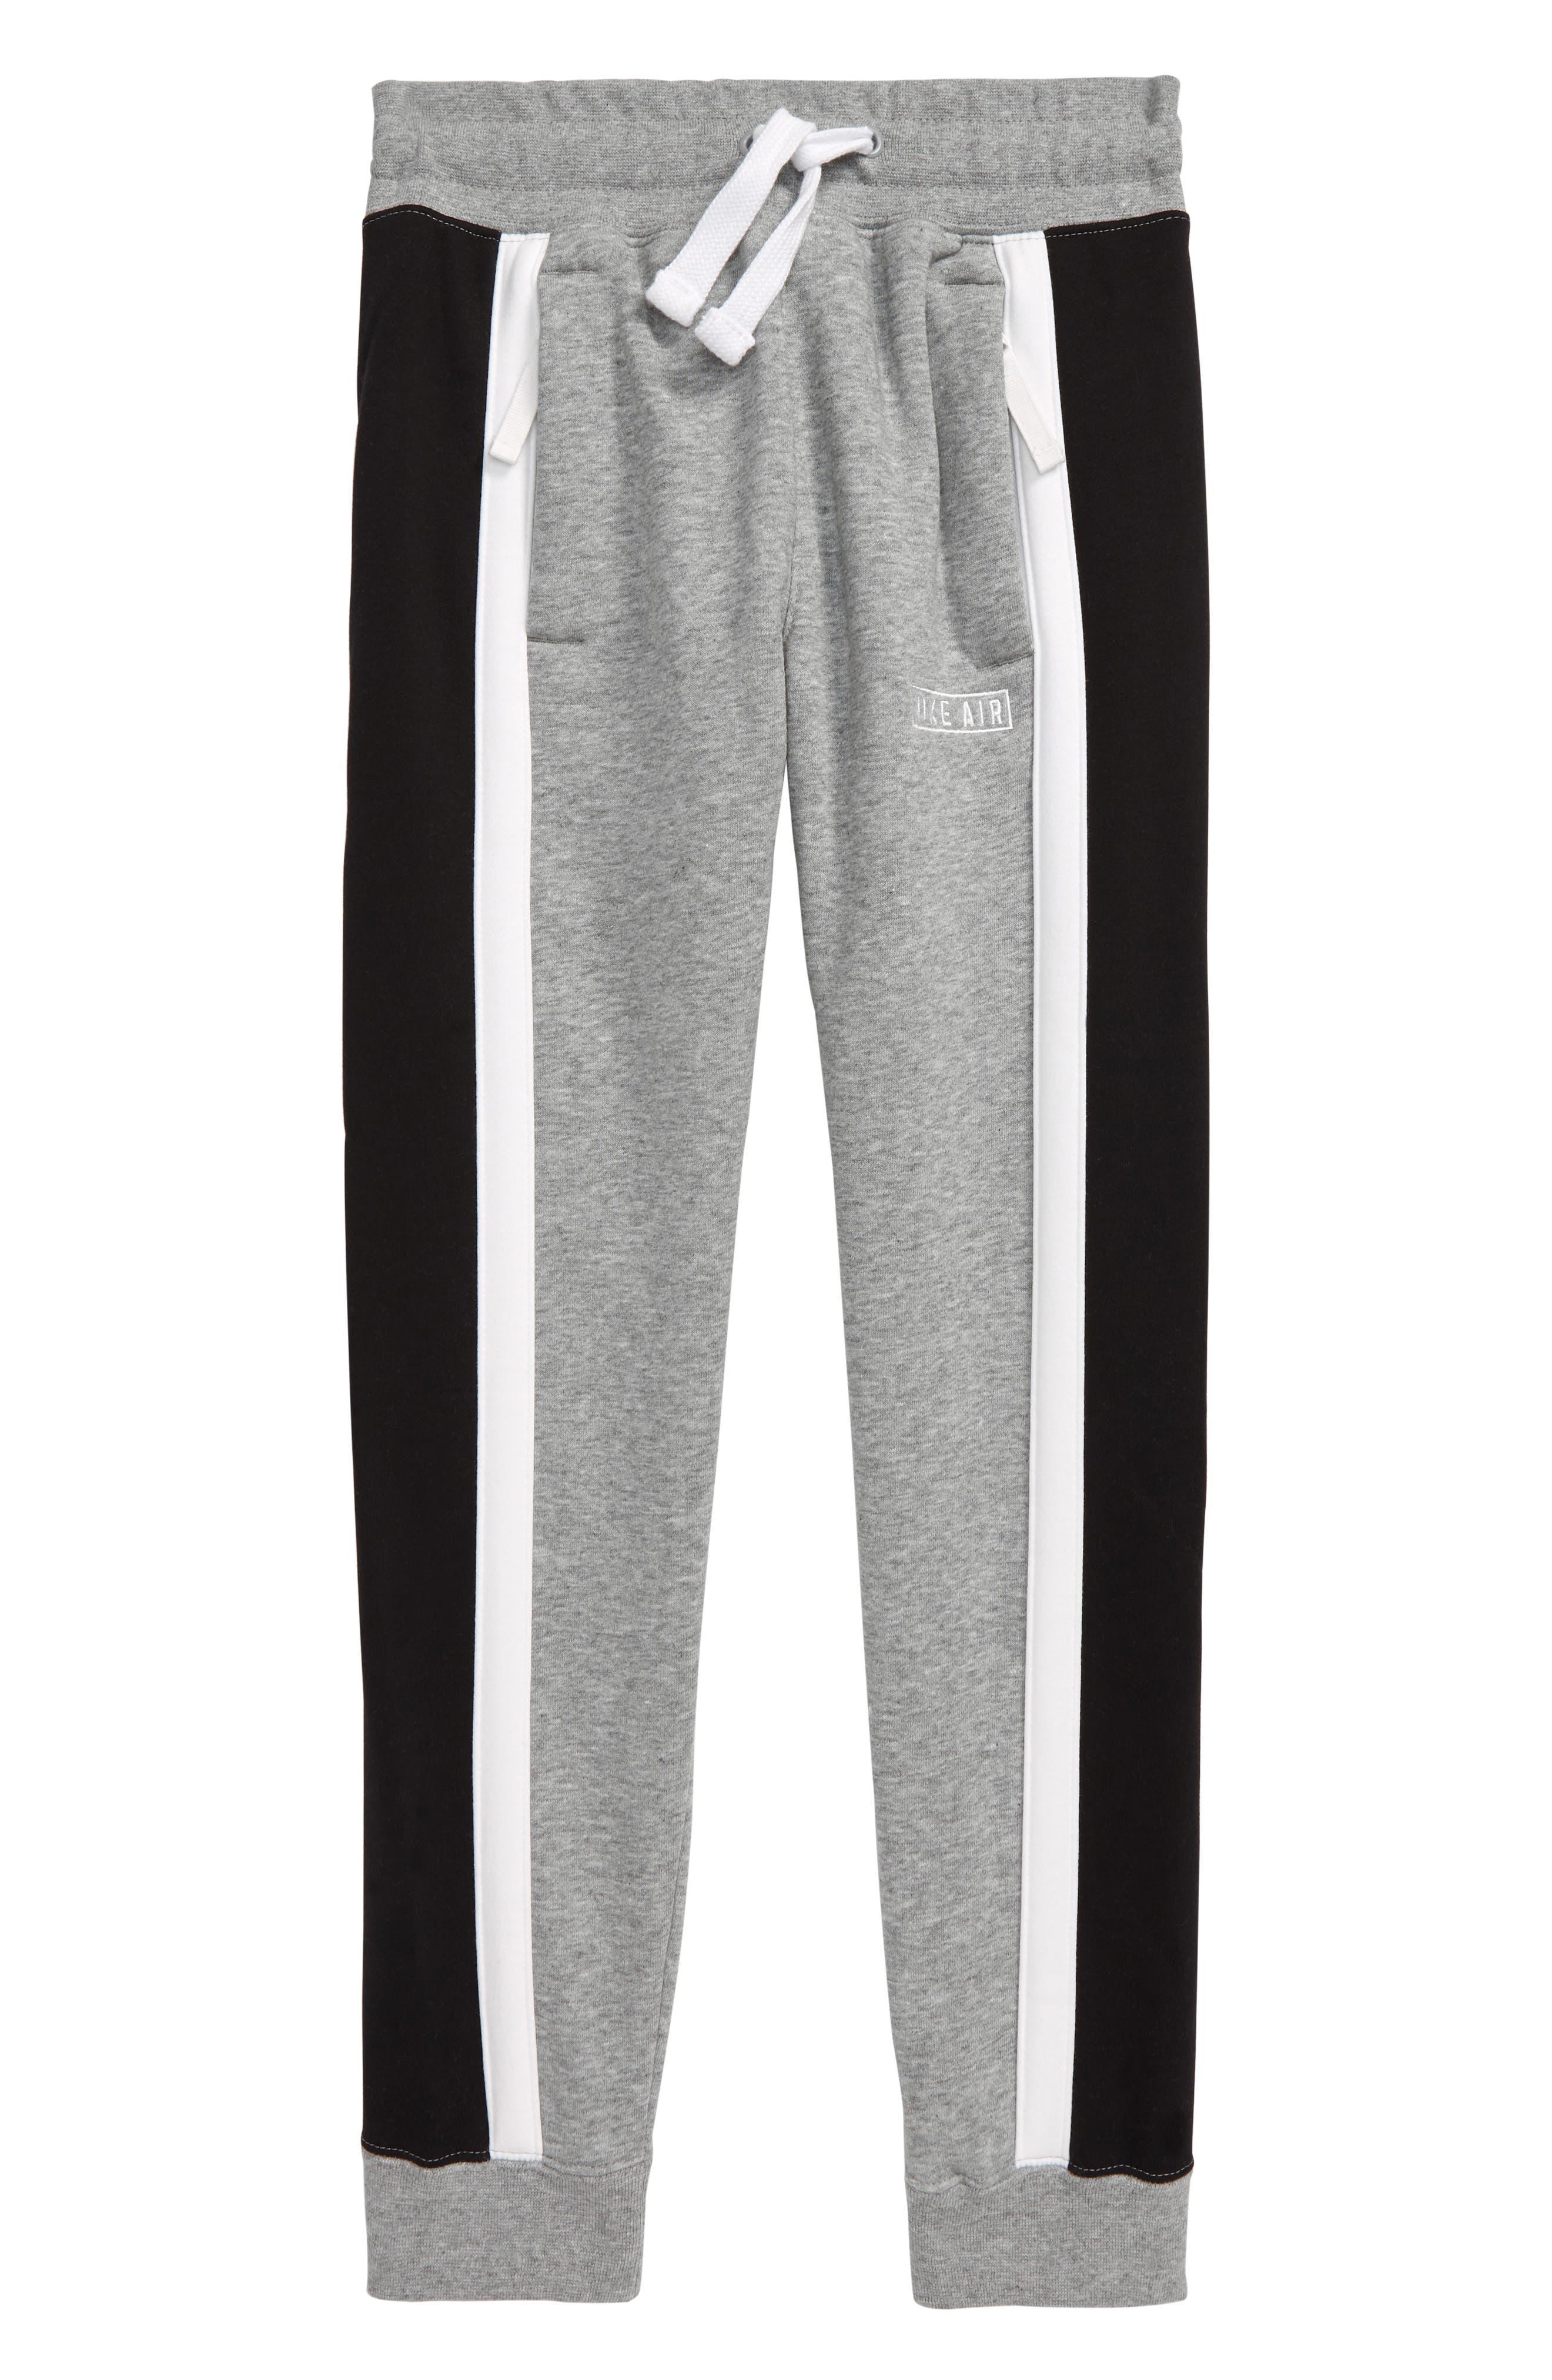 Nike Air Sweatpants (Little Boys \u0026 Big Boys)